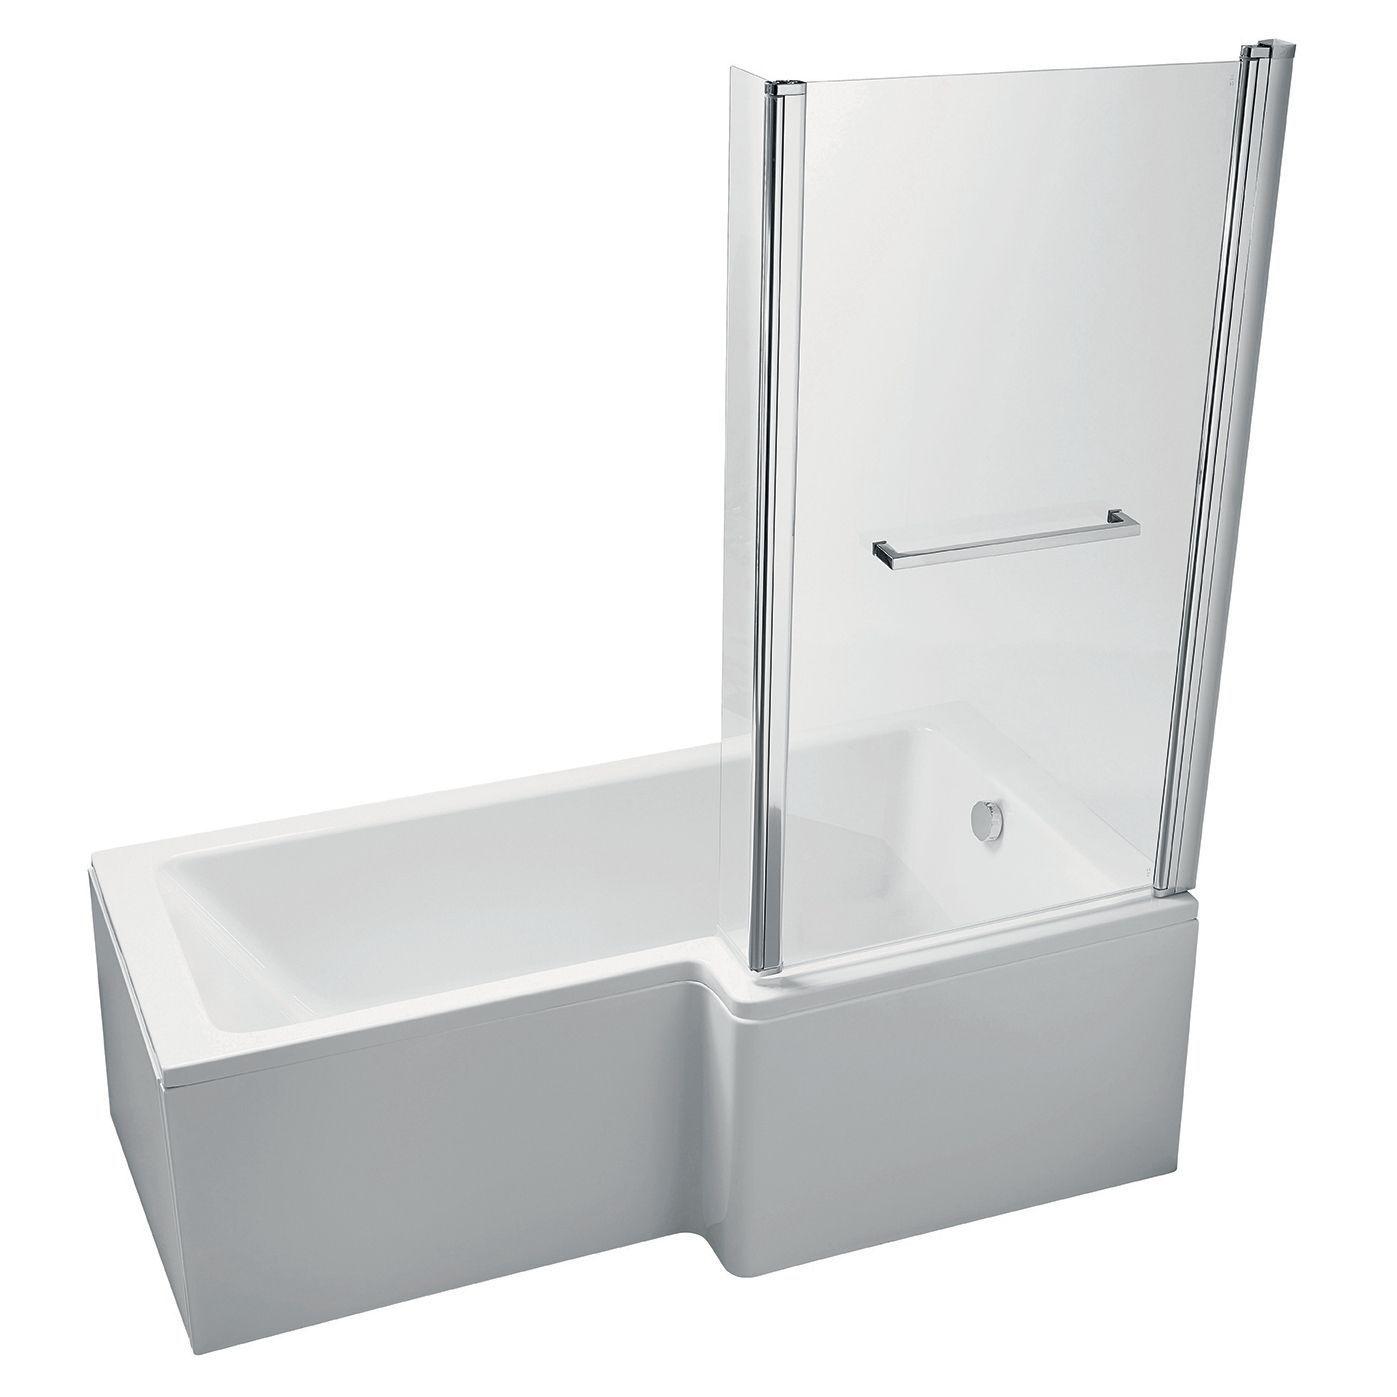 Ideal Standard Imagine RH Acrylic Rectangular Shower Bath Front Panel Screen L1695mm W845mm